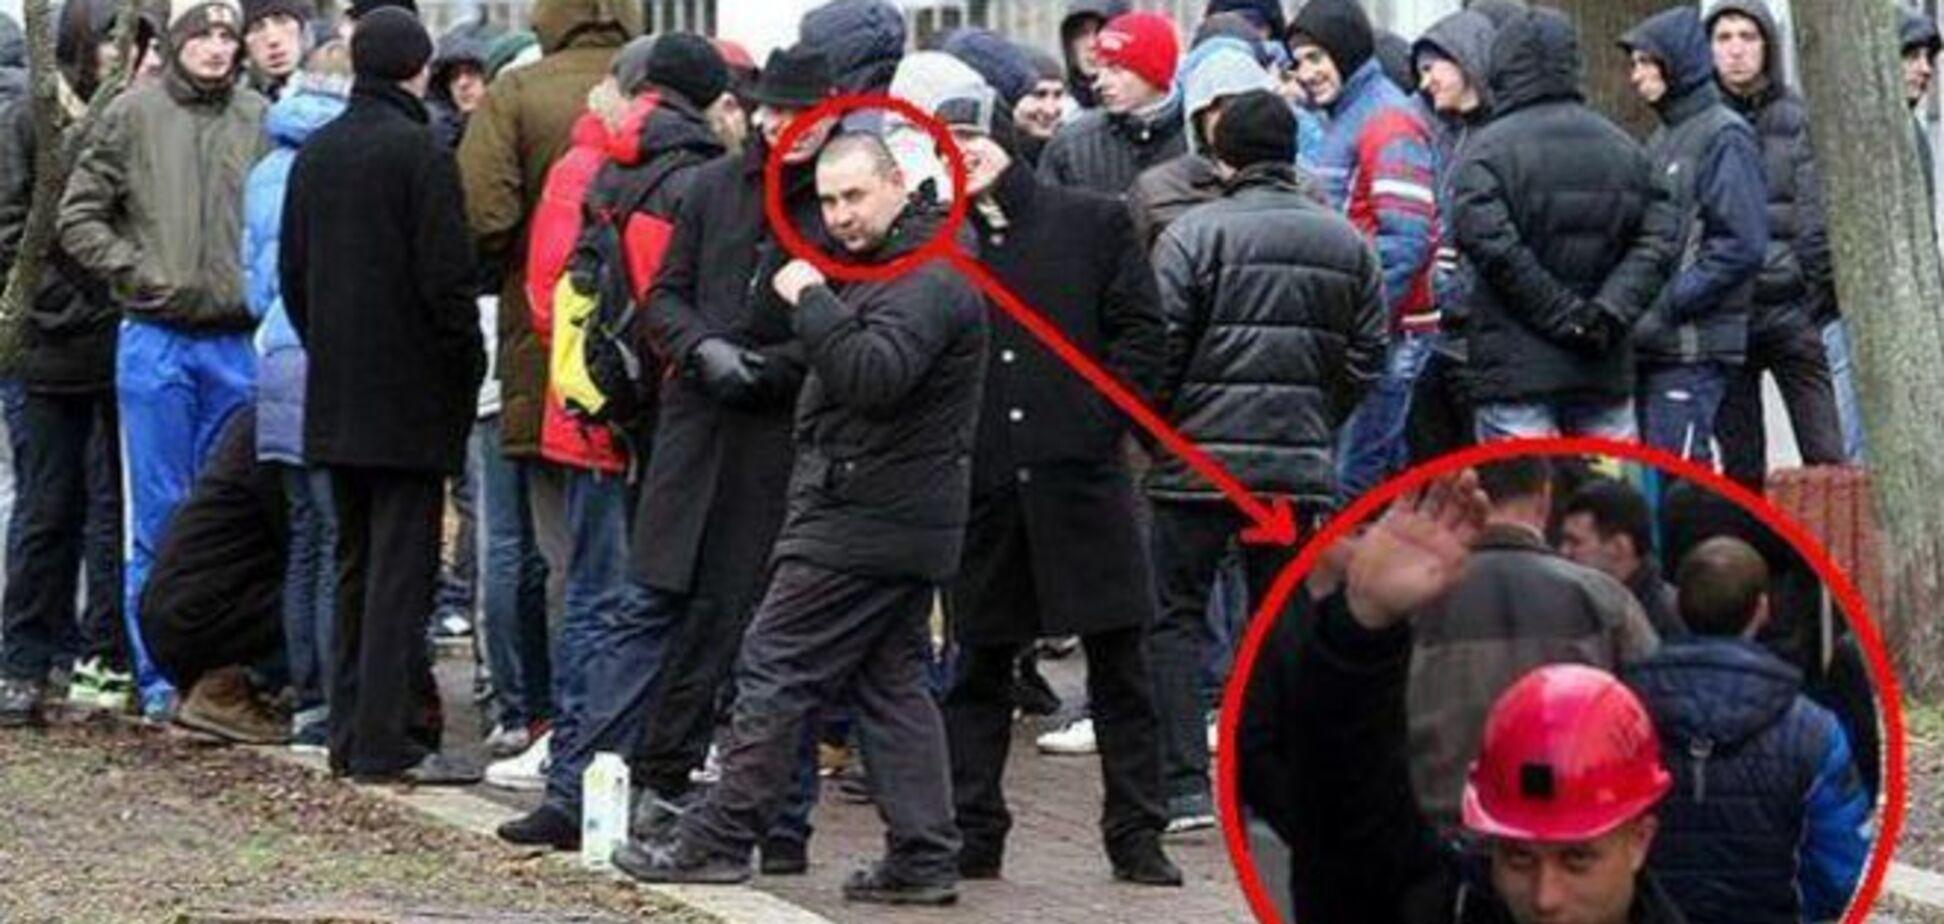 На протестах шахтеров в Киеве засветился 'титушка' с Антимайдана